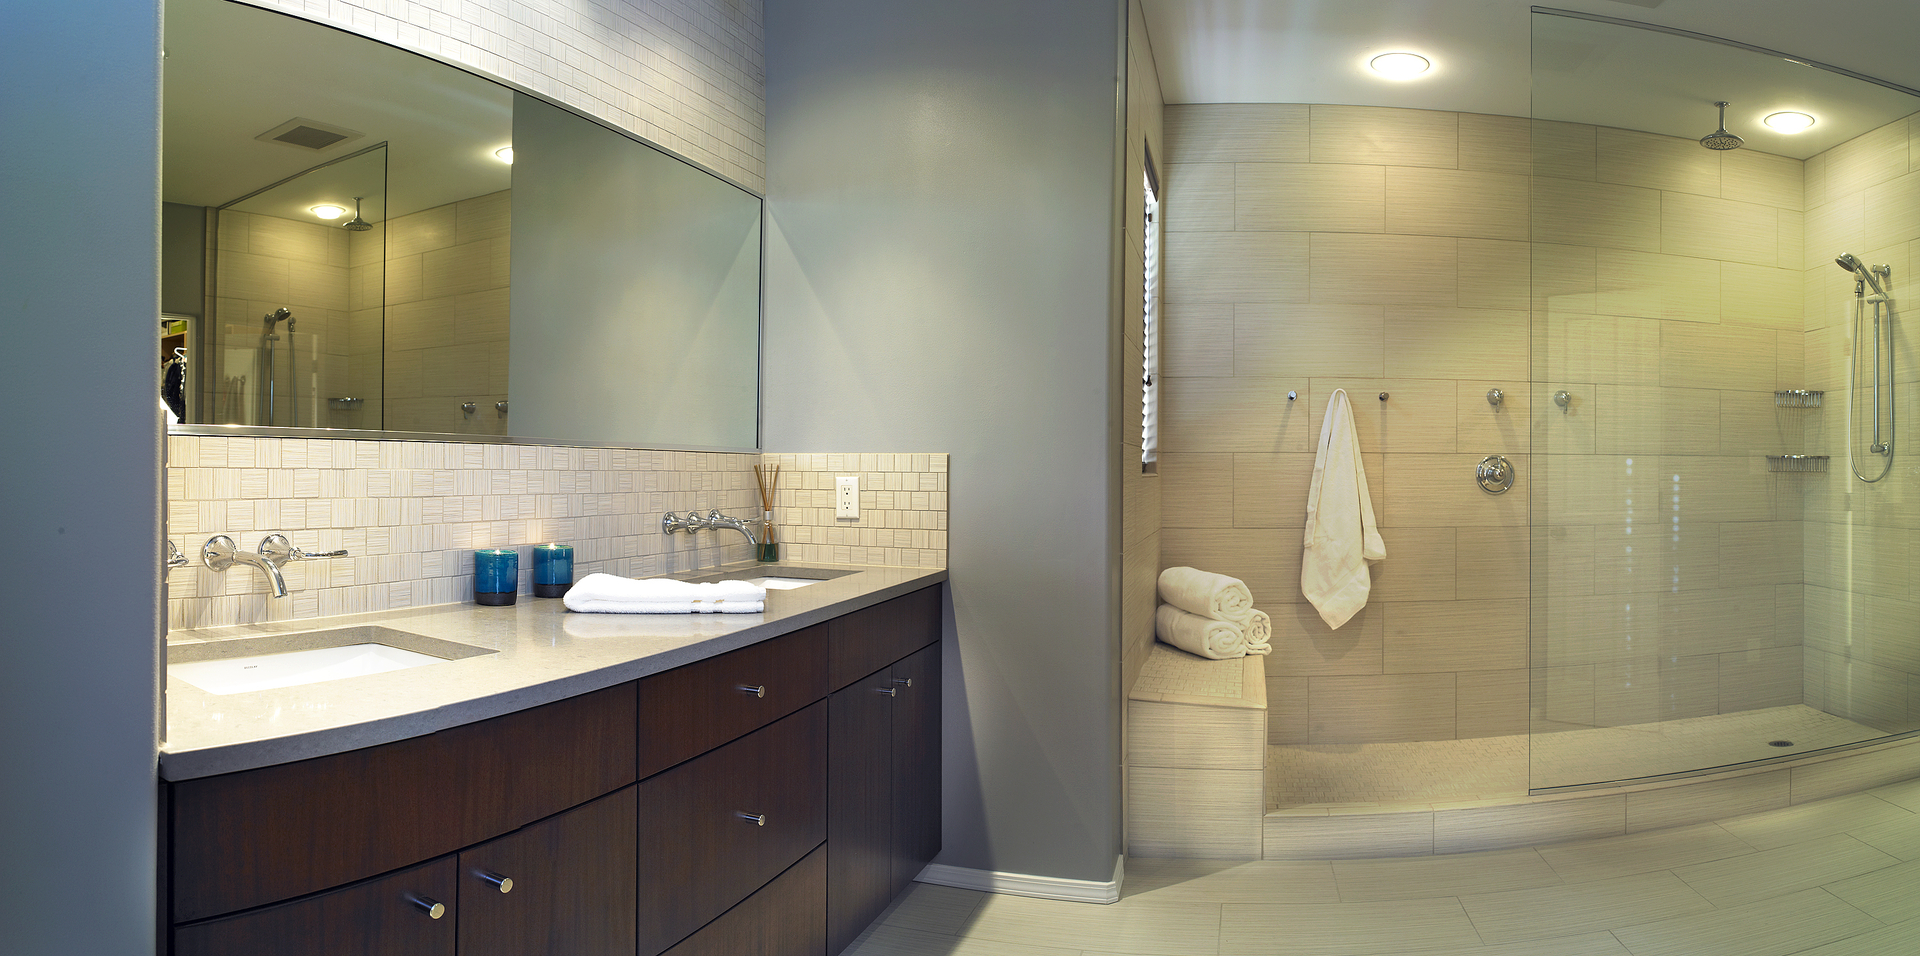 Bathroom Remodeling Albuquerque custom kitchen remodeling, custom kitchen cabinets - marc coan